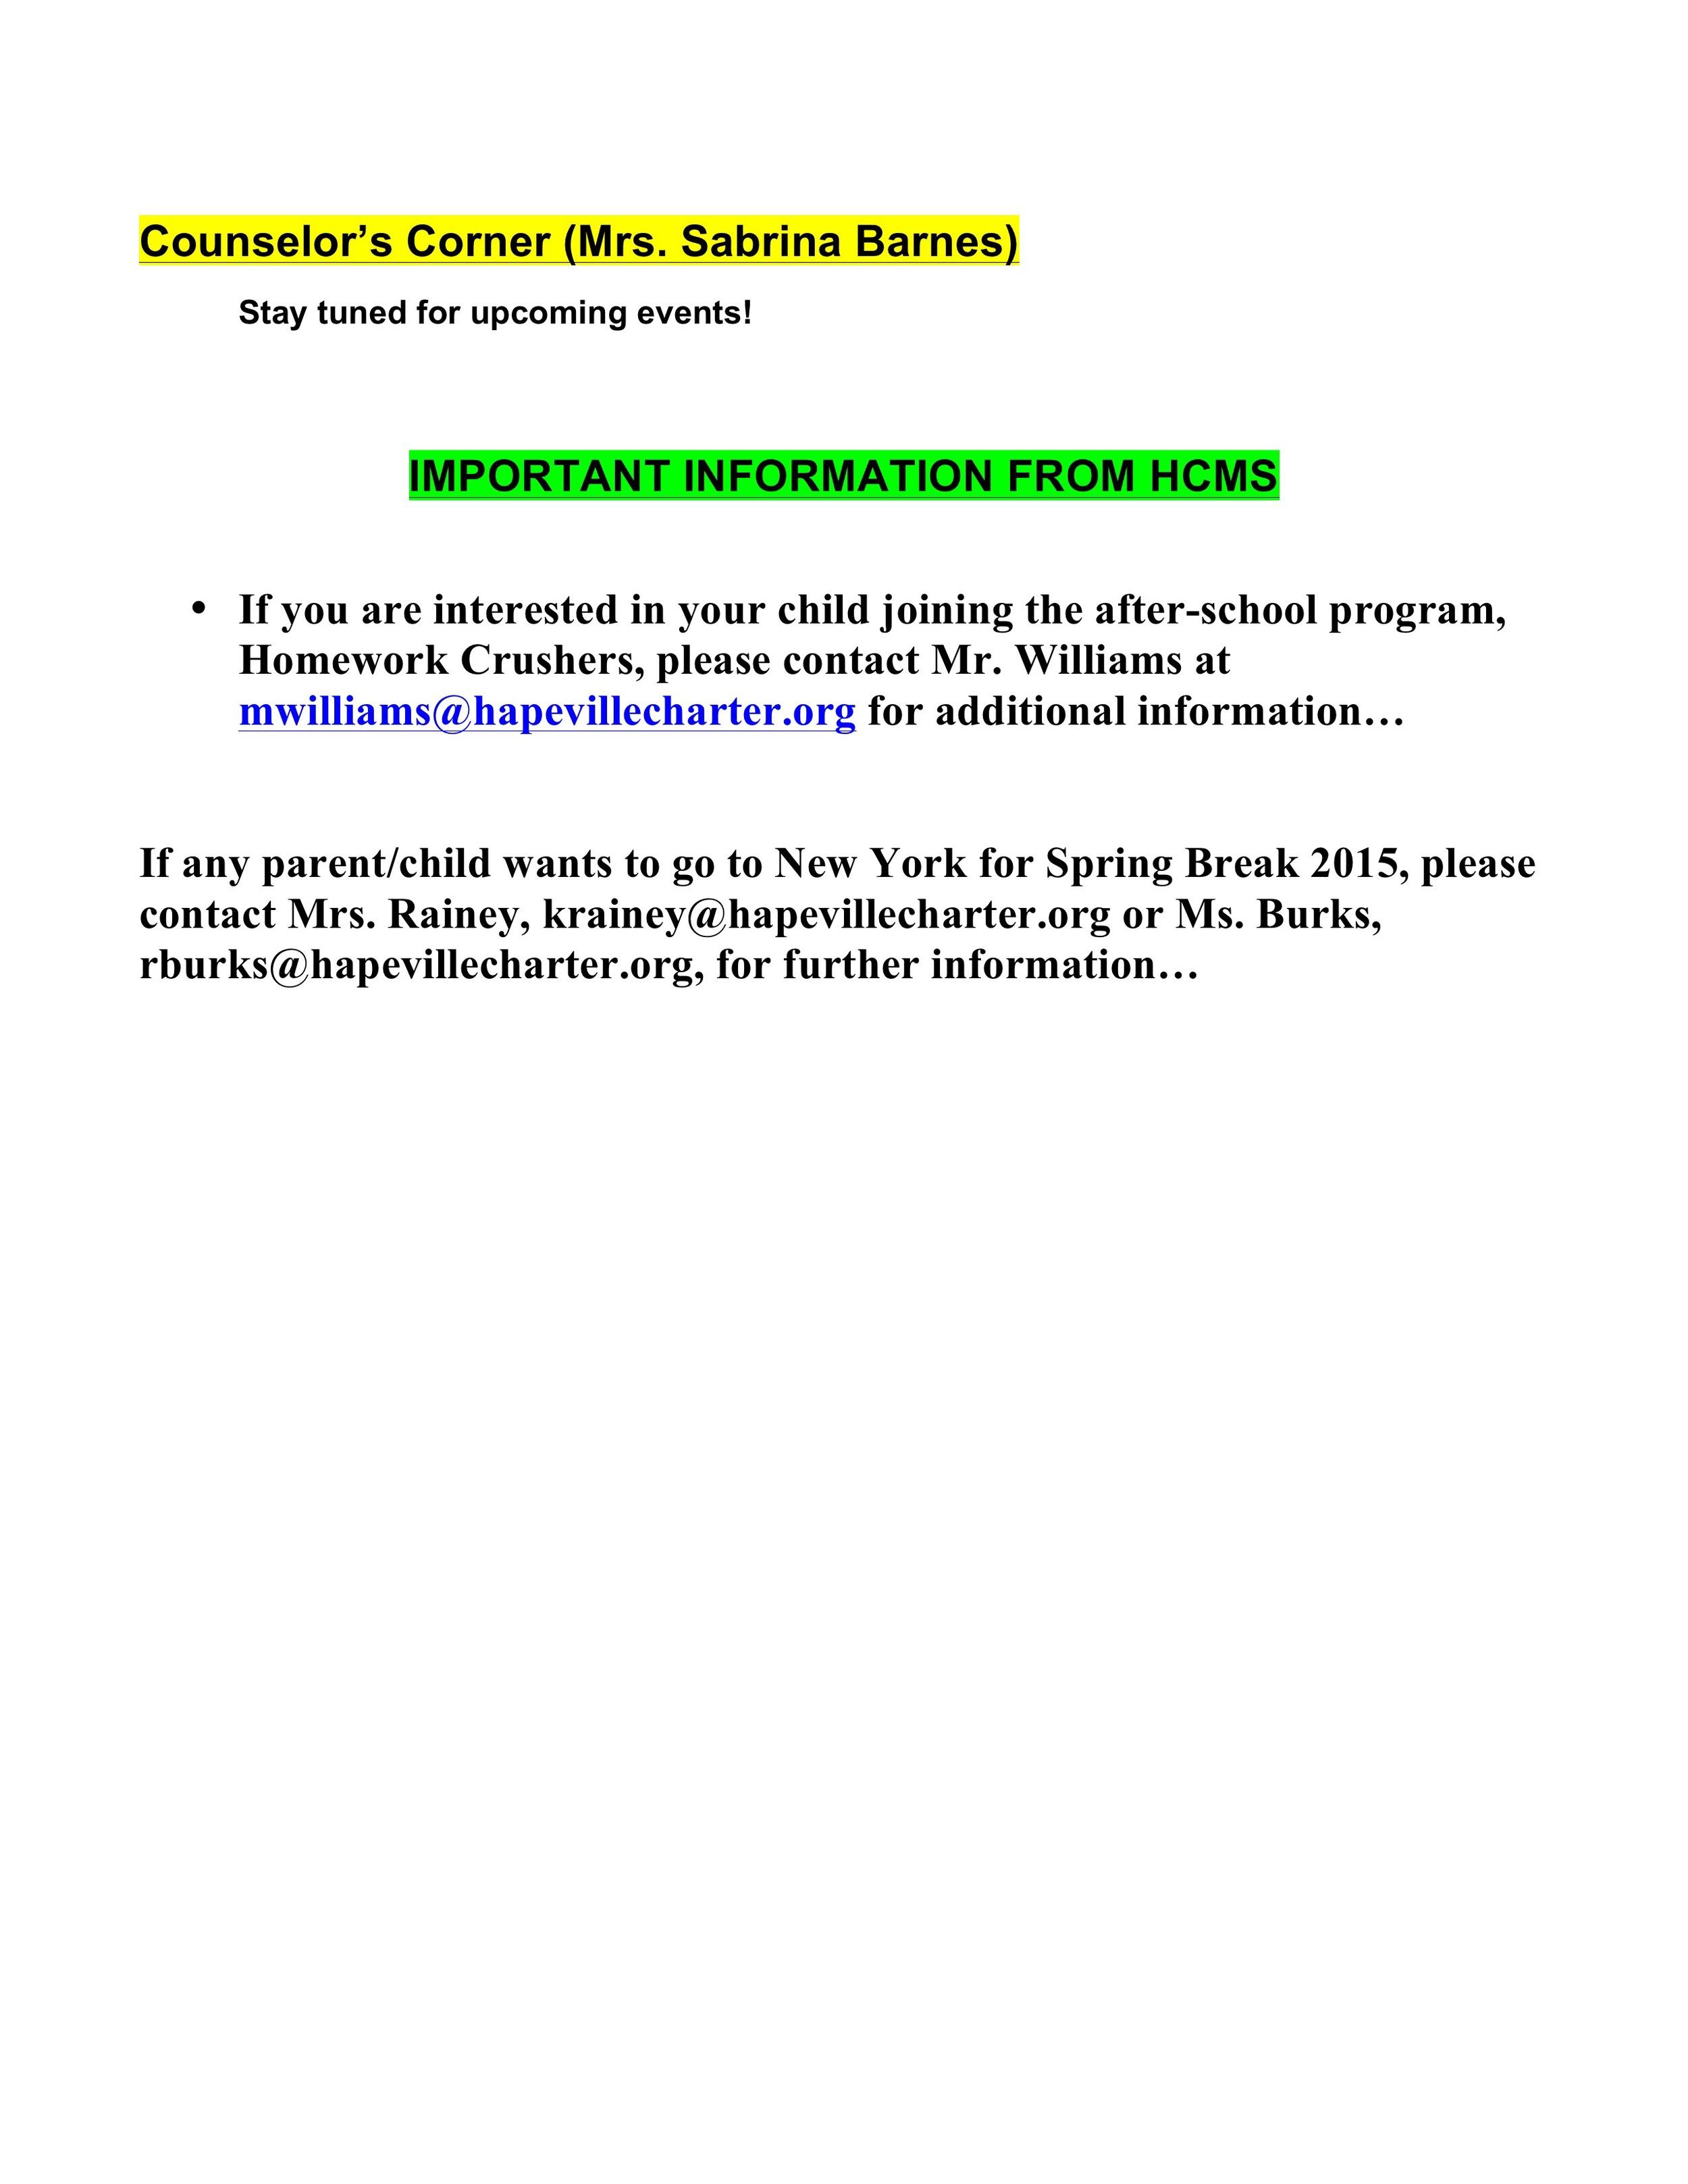 Newsletter Image7th grade nov 10-14 6.jpeg